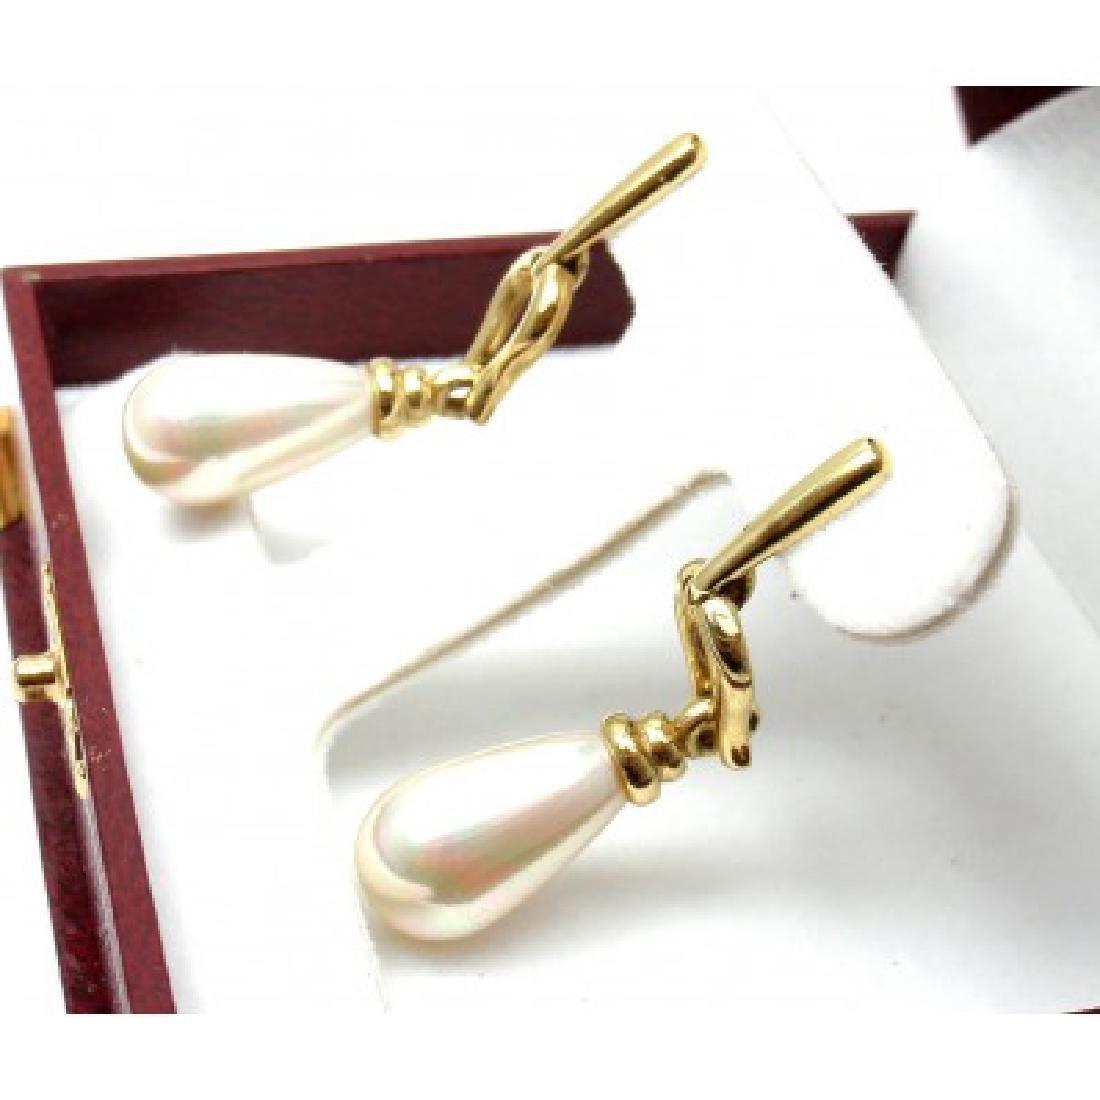 ESTATE YELLOW GOLD PEARL DROP EARRINGS - 4